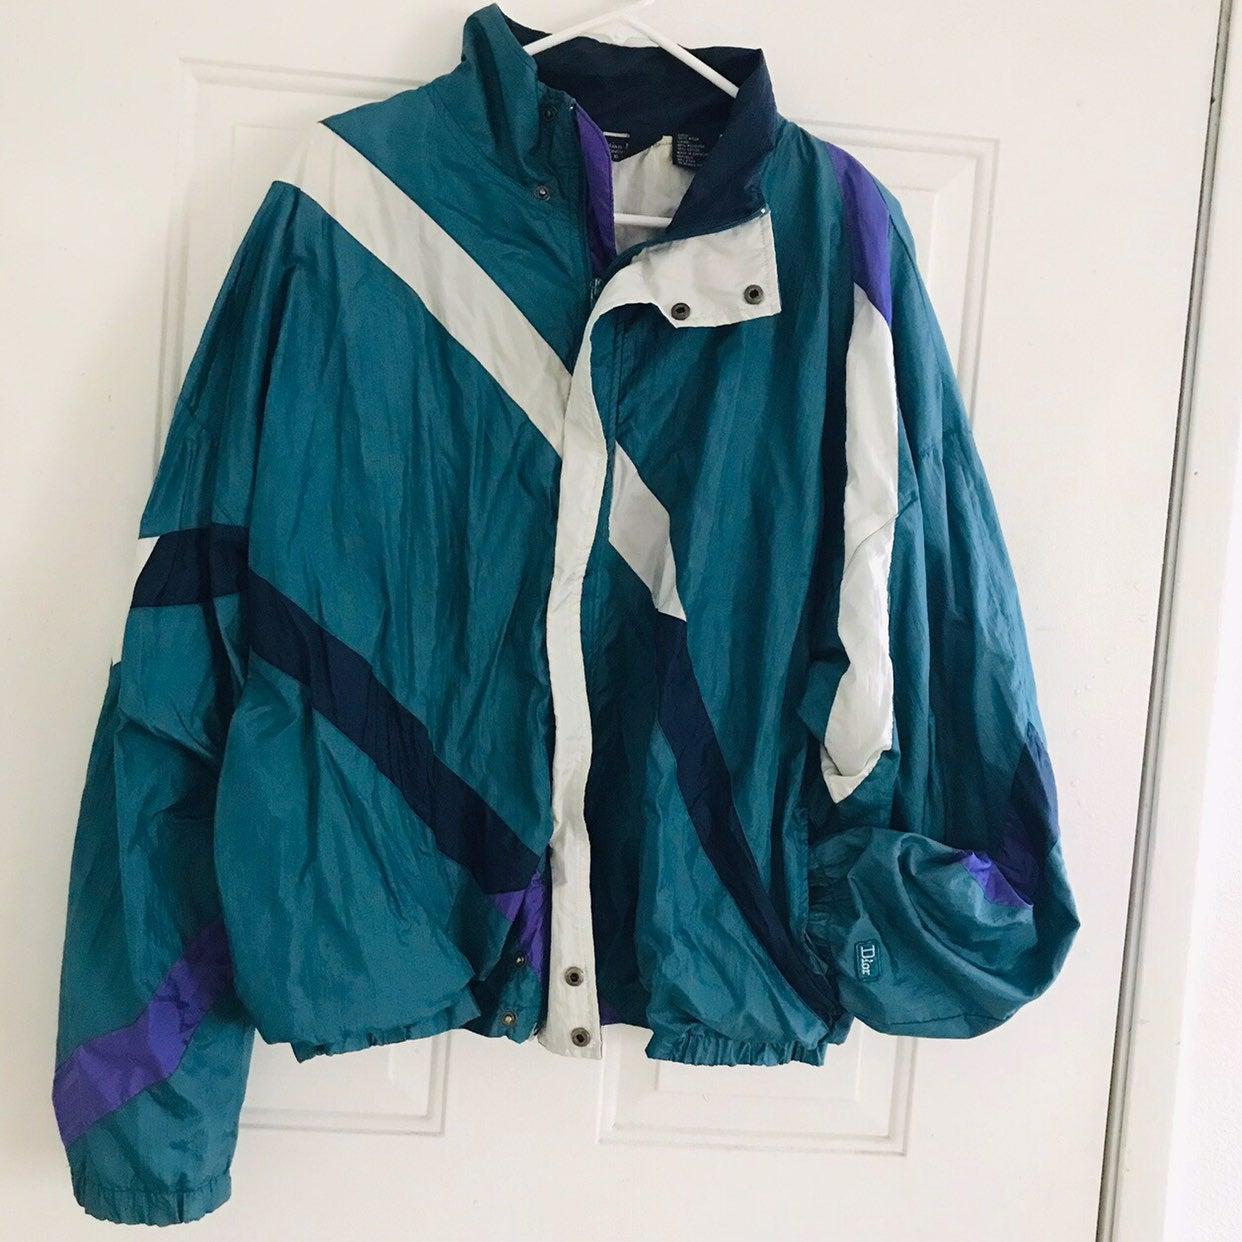 Christian Dior windbreaker jacket